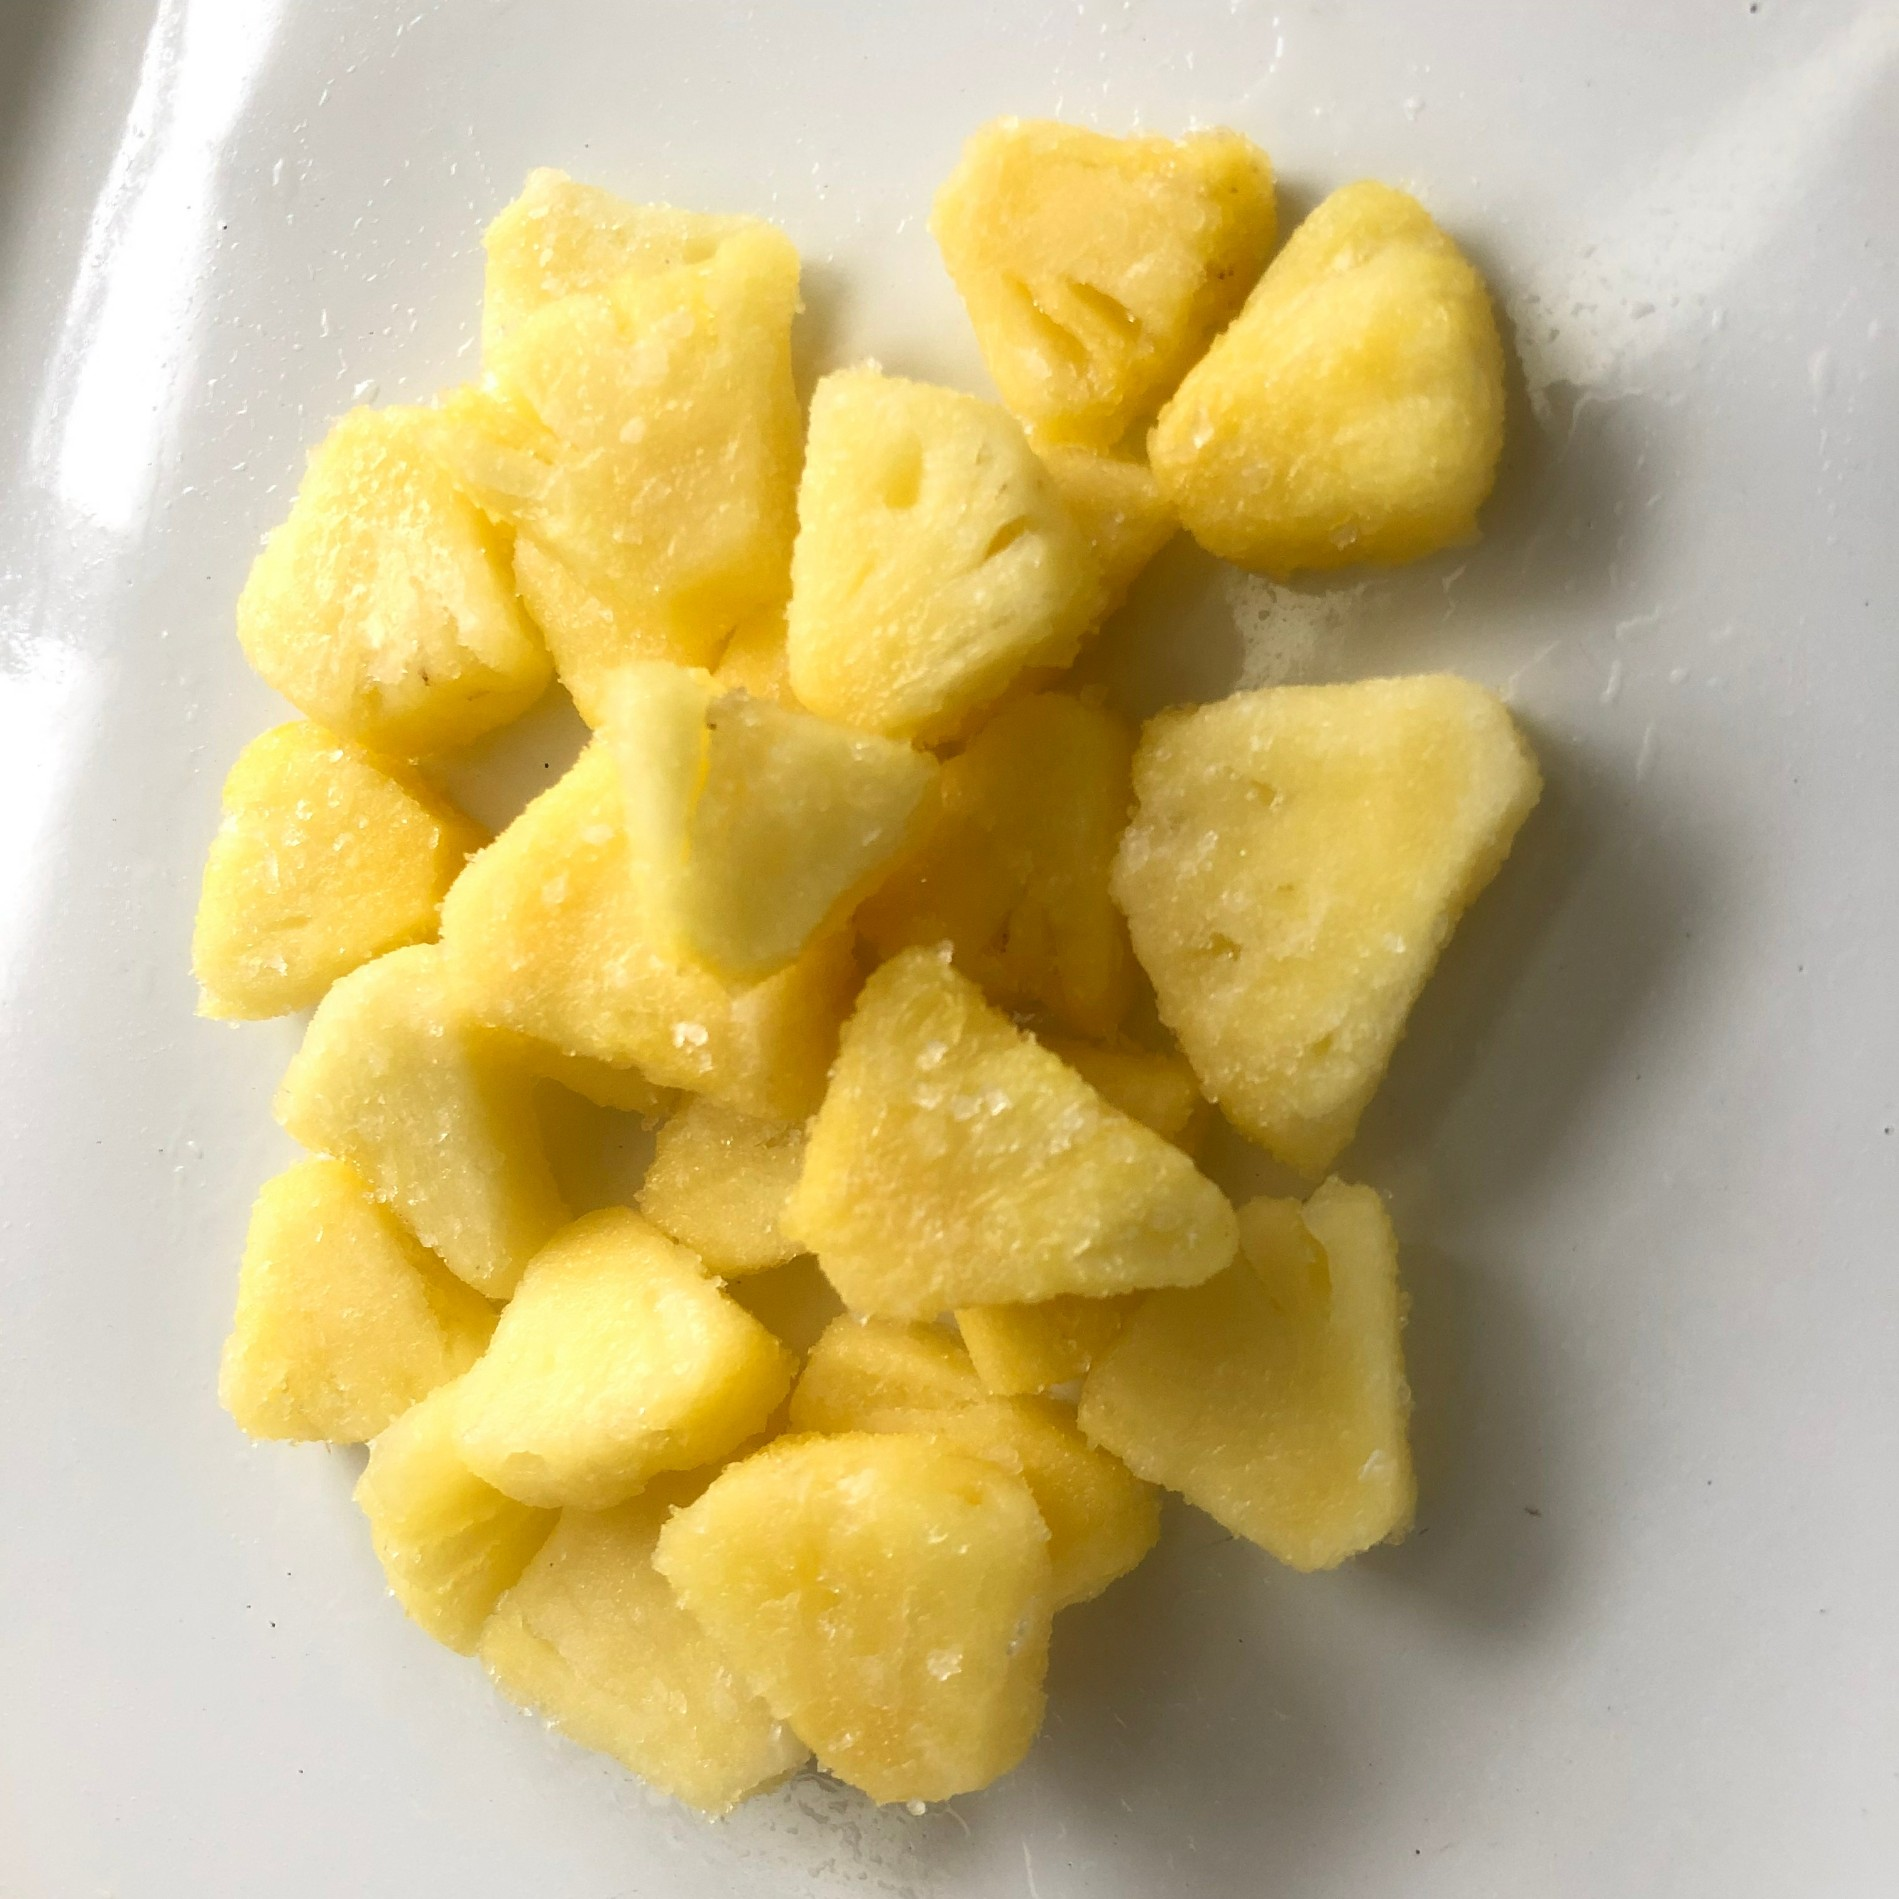 IQF Frozen Pineapple Manufacturers, IQF Frozen Pineapple Factory, Supply IQF Frozen Pineapple